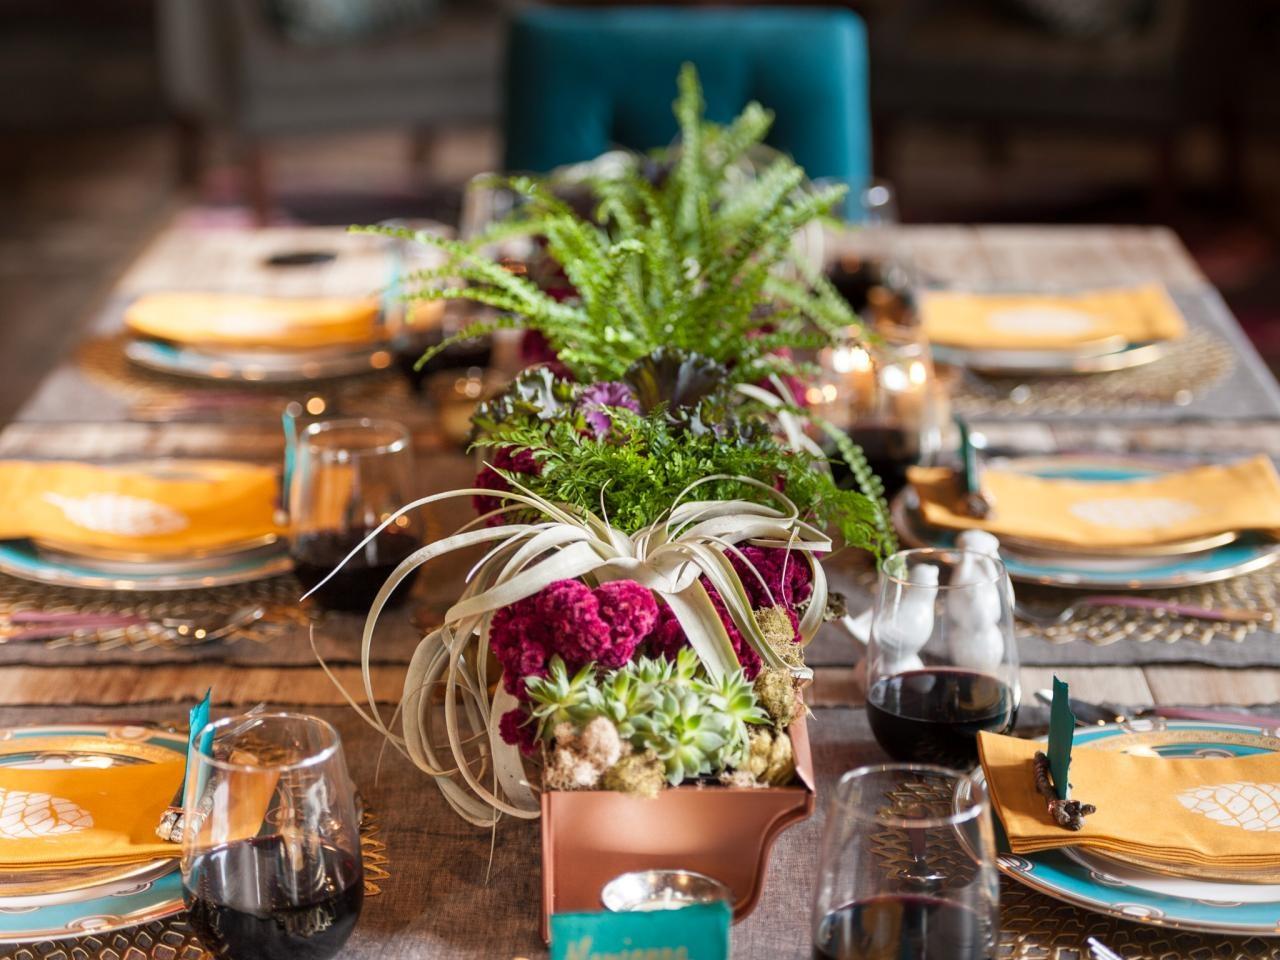 original_holidays-at-home-table-full_h.jpg.rend.hgtvcom.1280.960.